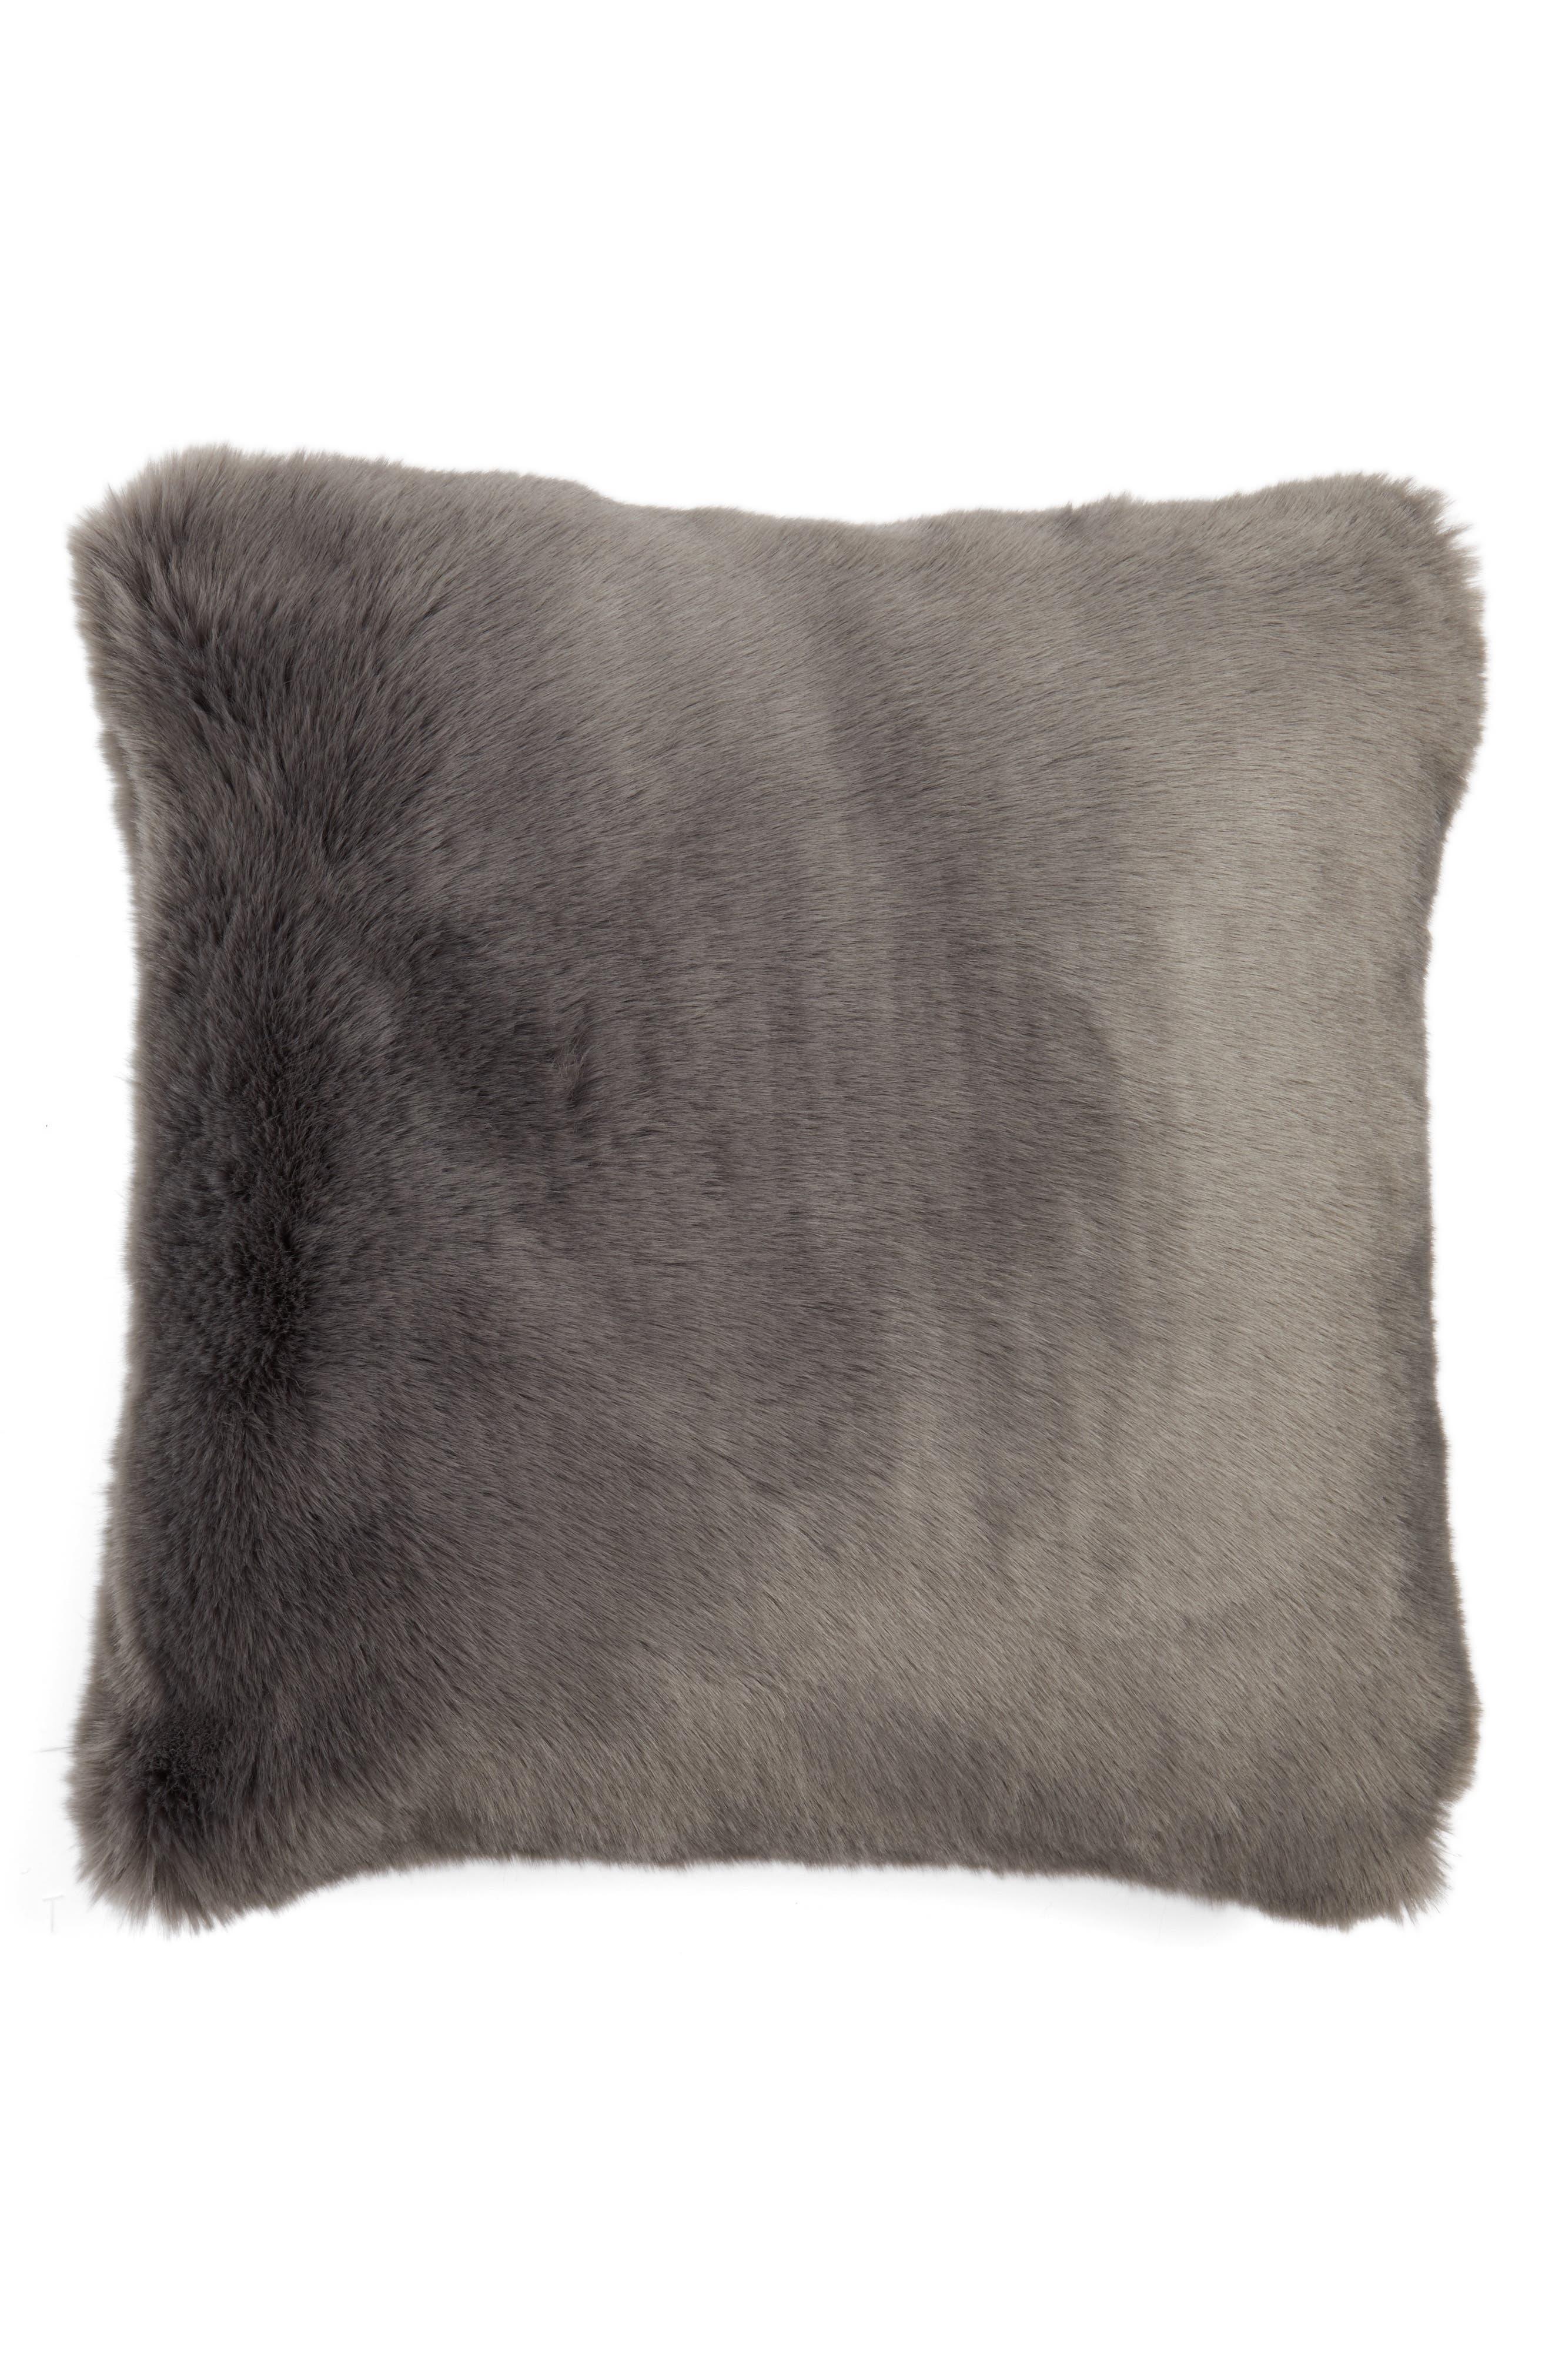 01df020ac2f2 Decorative   Throw Pillows